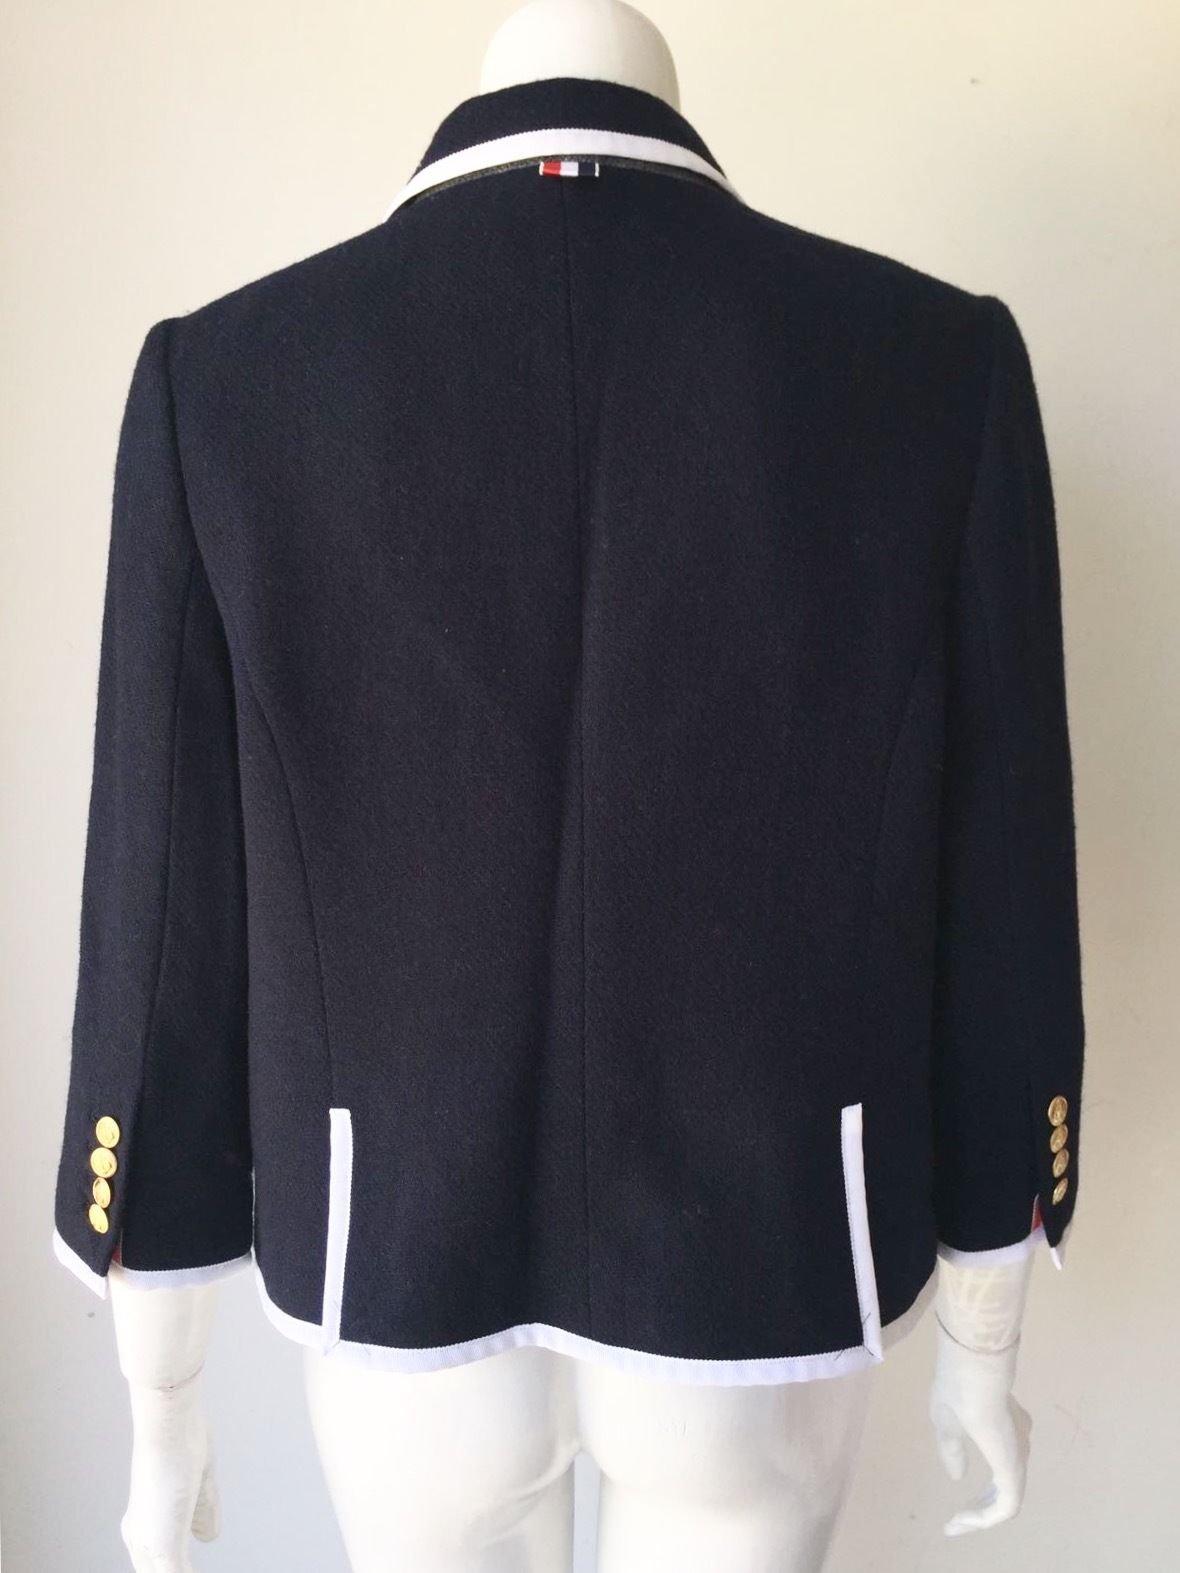 Thom Browne for Neiman Marcus + Target Navy Wool Blazer Size Medium by Thom Browne (Image #6)